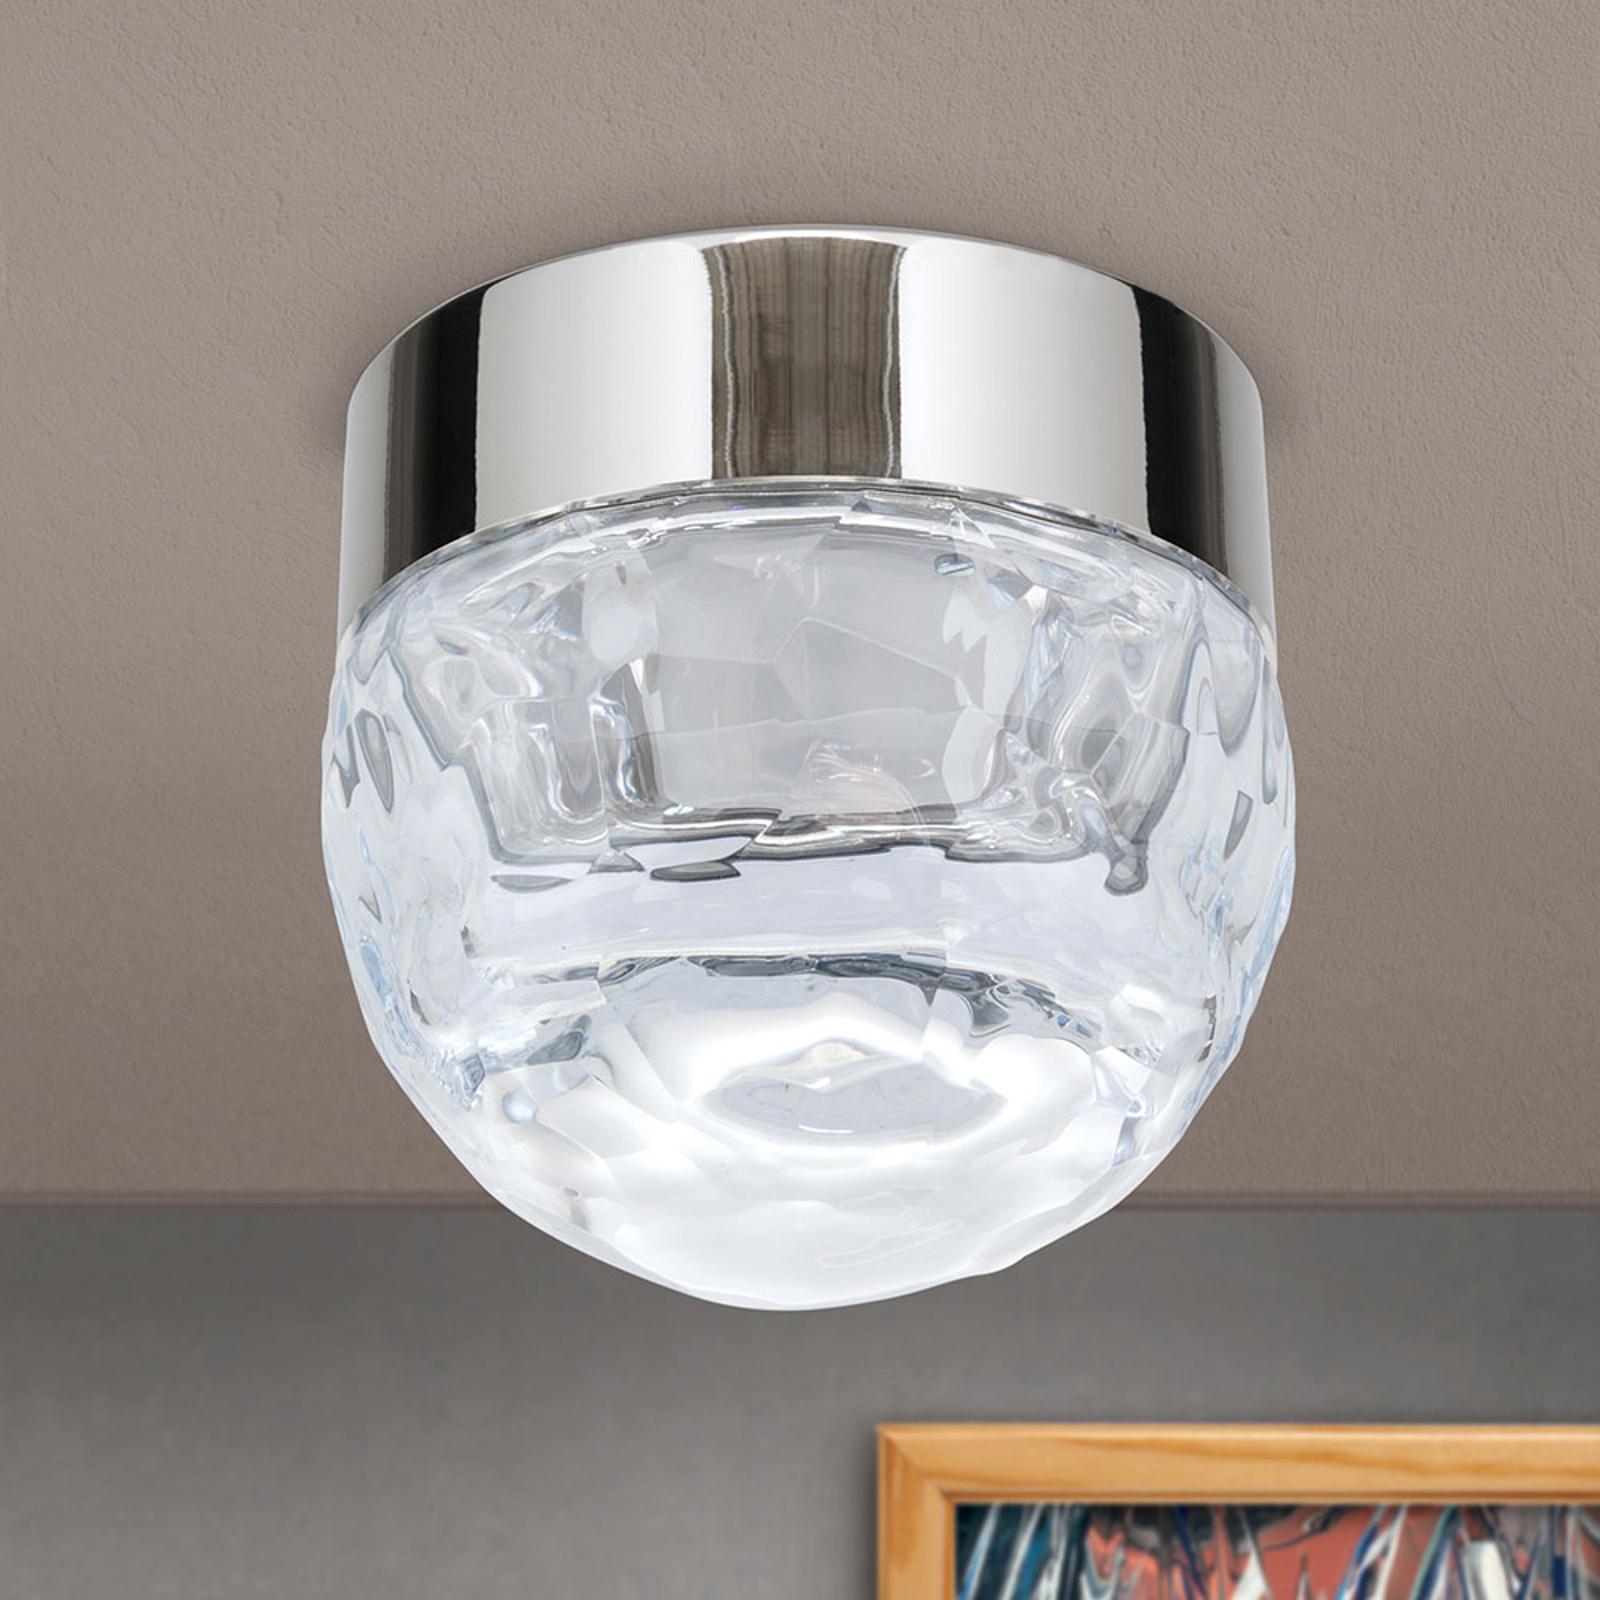 LED plafondlamp Ball 1-lamp, nikkel, rond